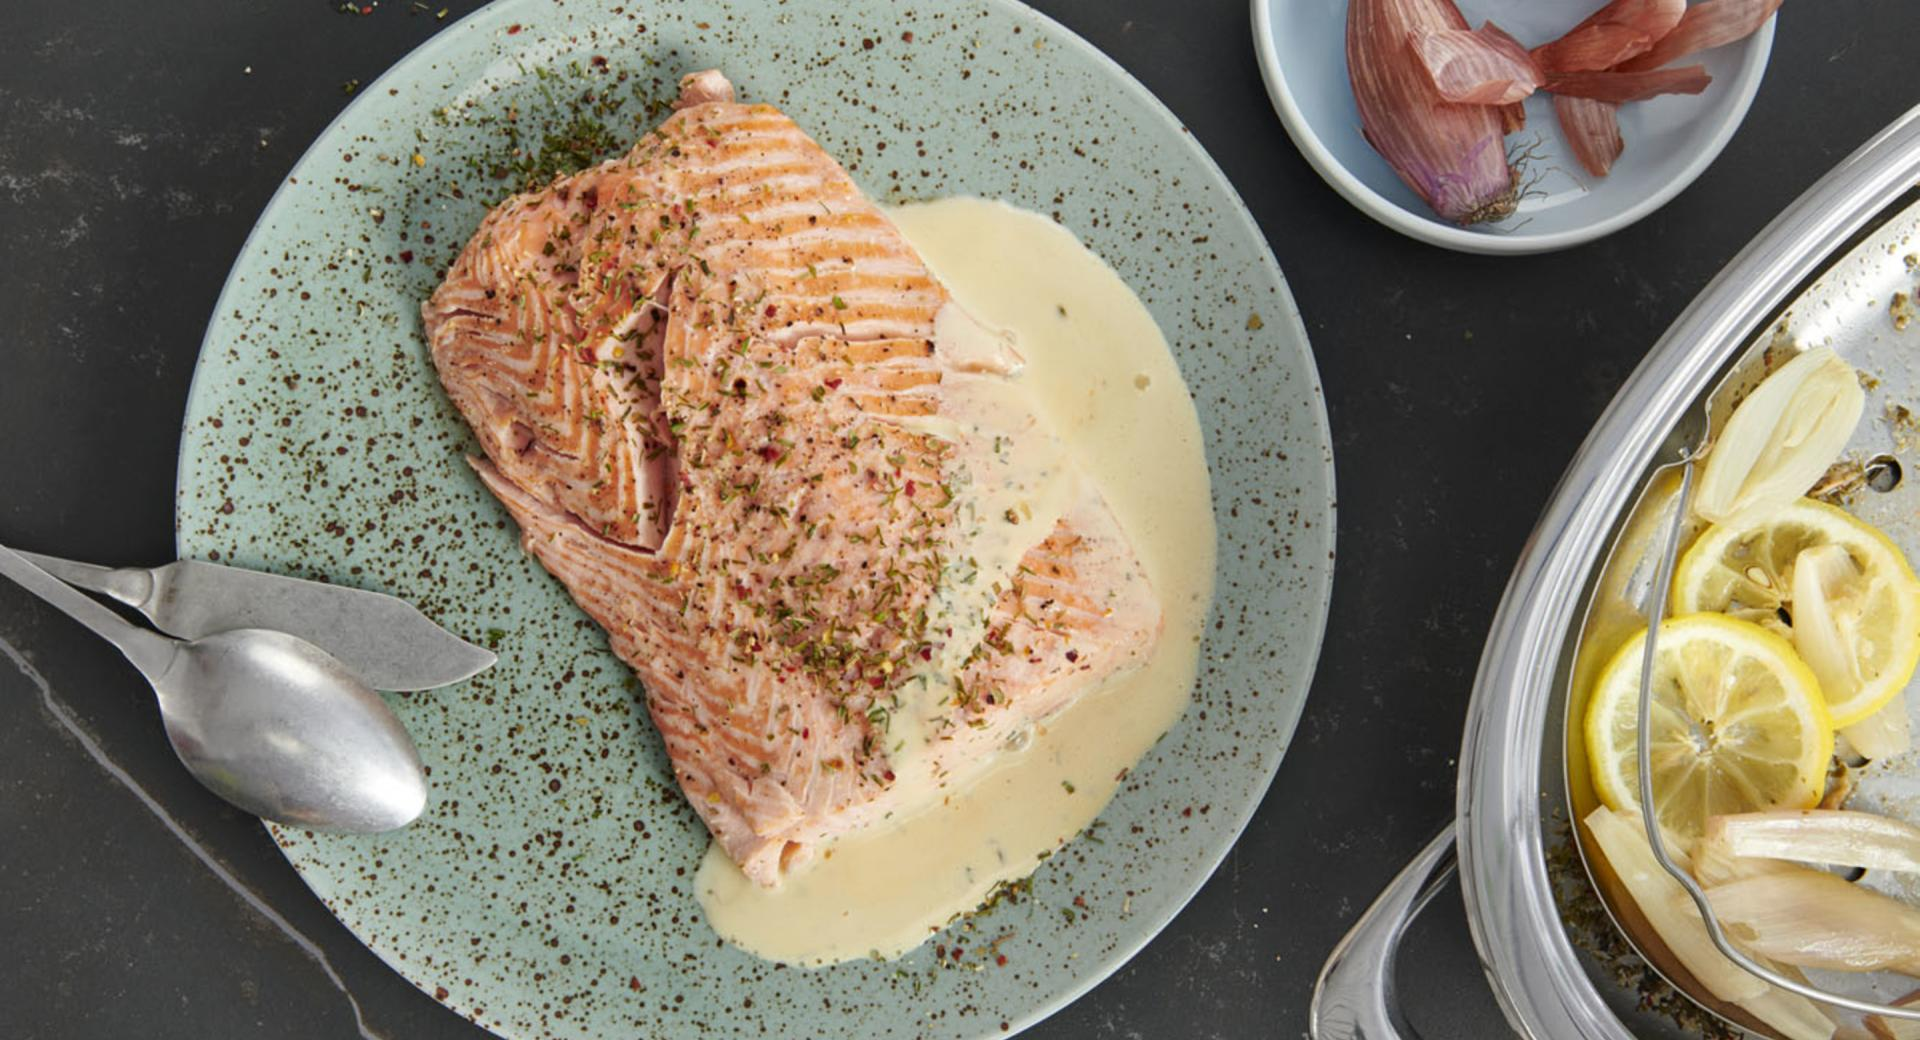 Salmon fillet with seasoned hollandaise